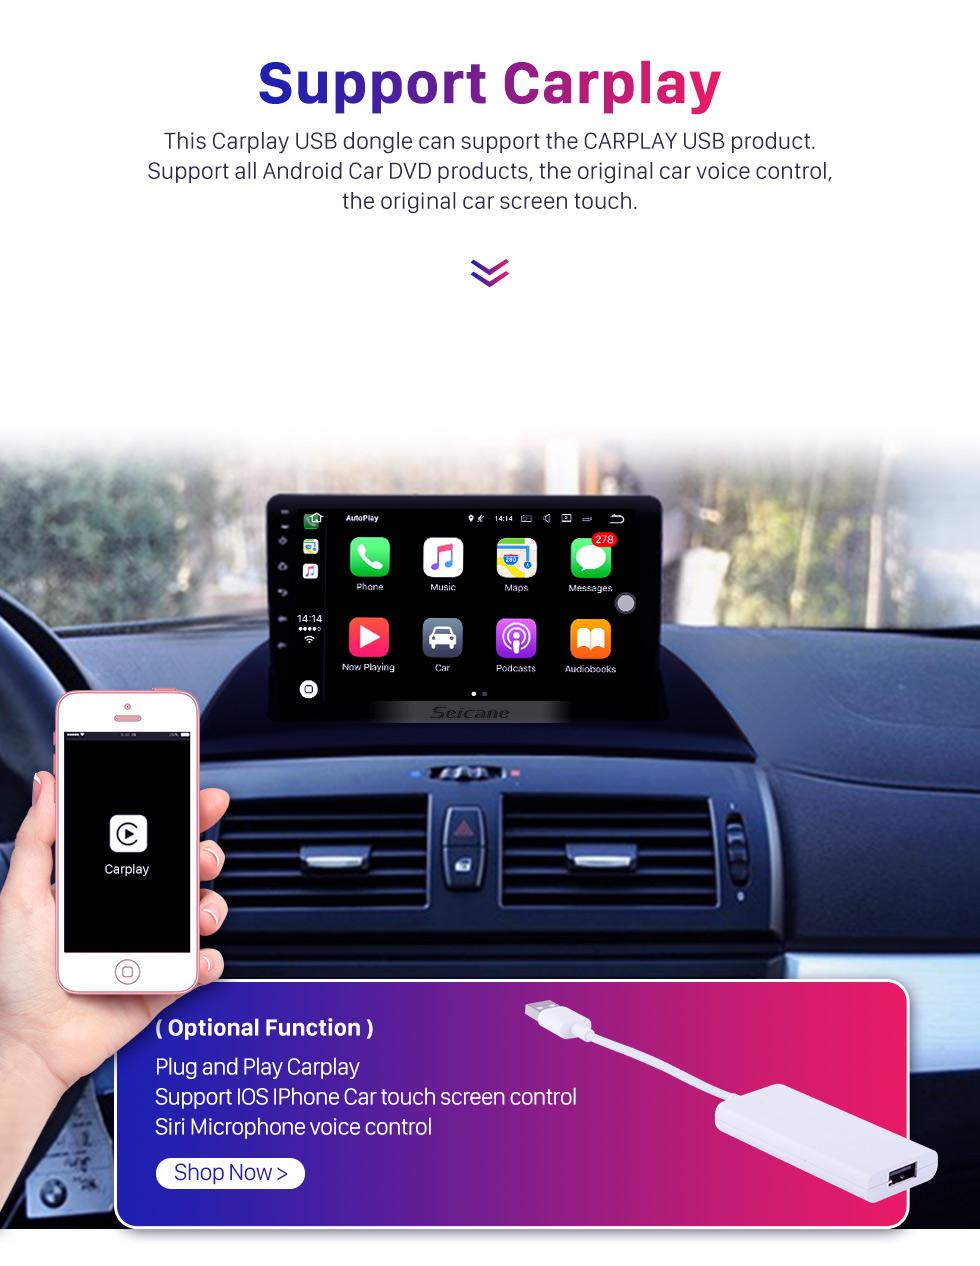 Seicane Android 9.0 9 inch 2004-2012 BMW X3 E83 2.0i 2.5i 2.5si 3.0i 3.0si 2.0d 3.0d 3.0sd GPS Auto Navigation System with AM FM Radio Bluetooth Music TV Tuner Backup camera 3G WIFI